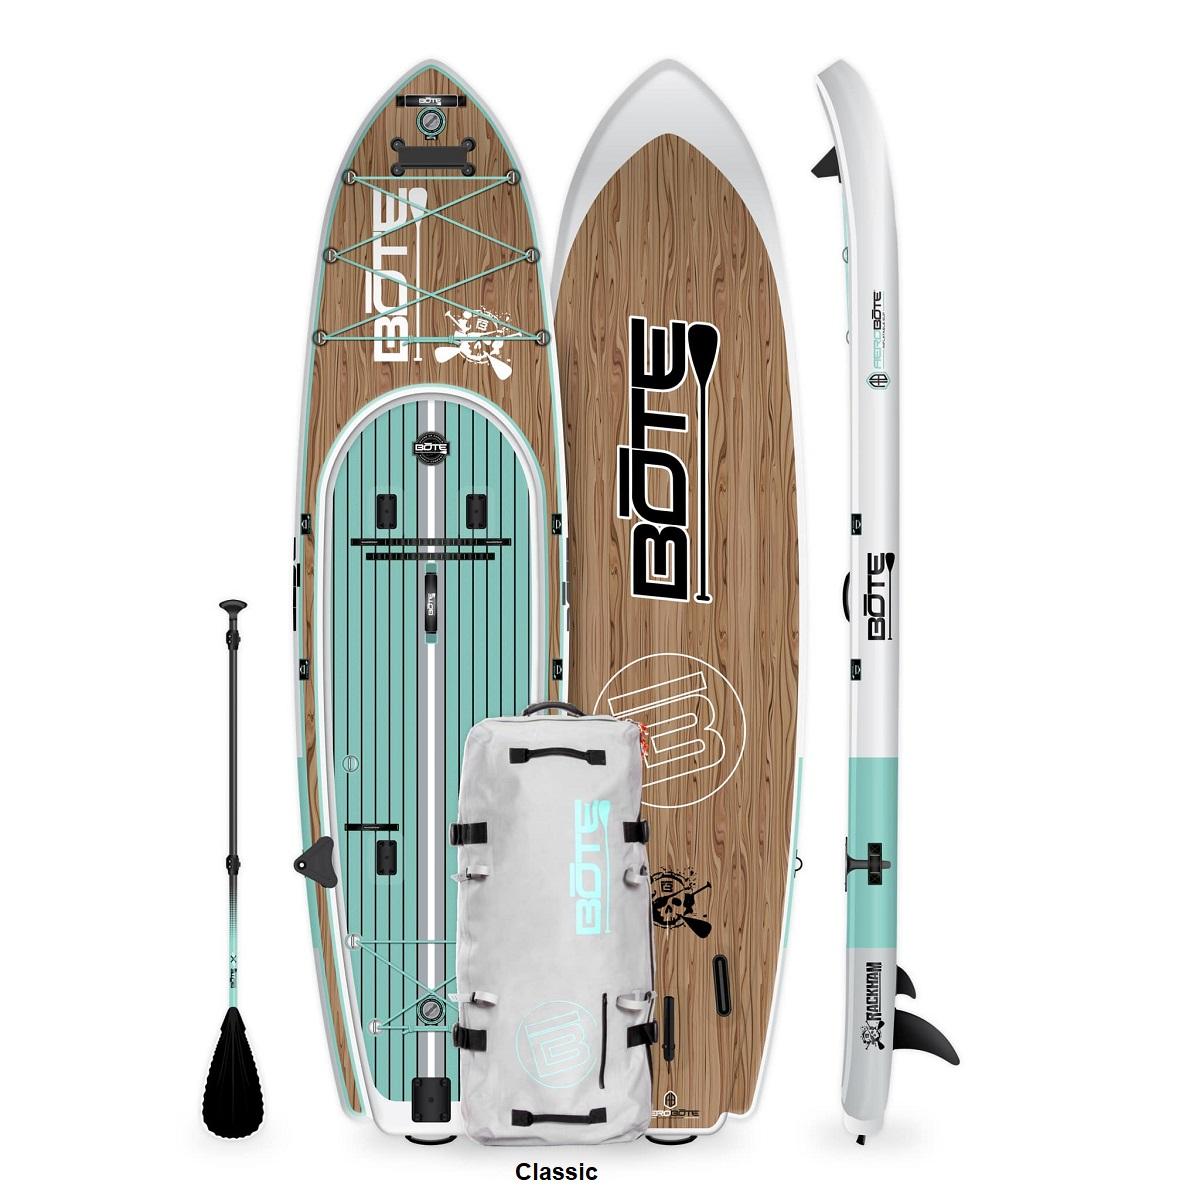 BOTE Rackham Aero Inflatable Paddle Board- Classic